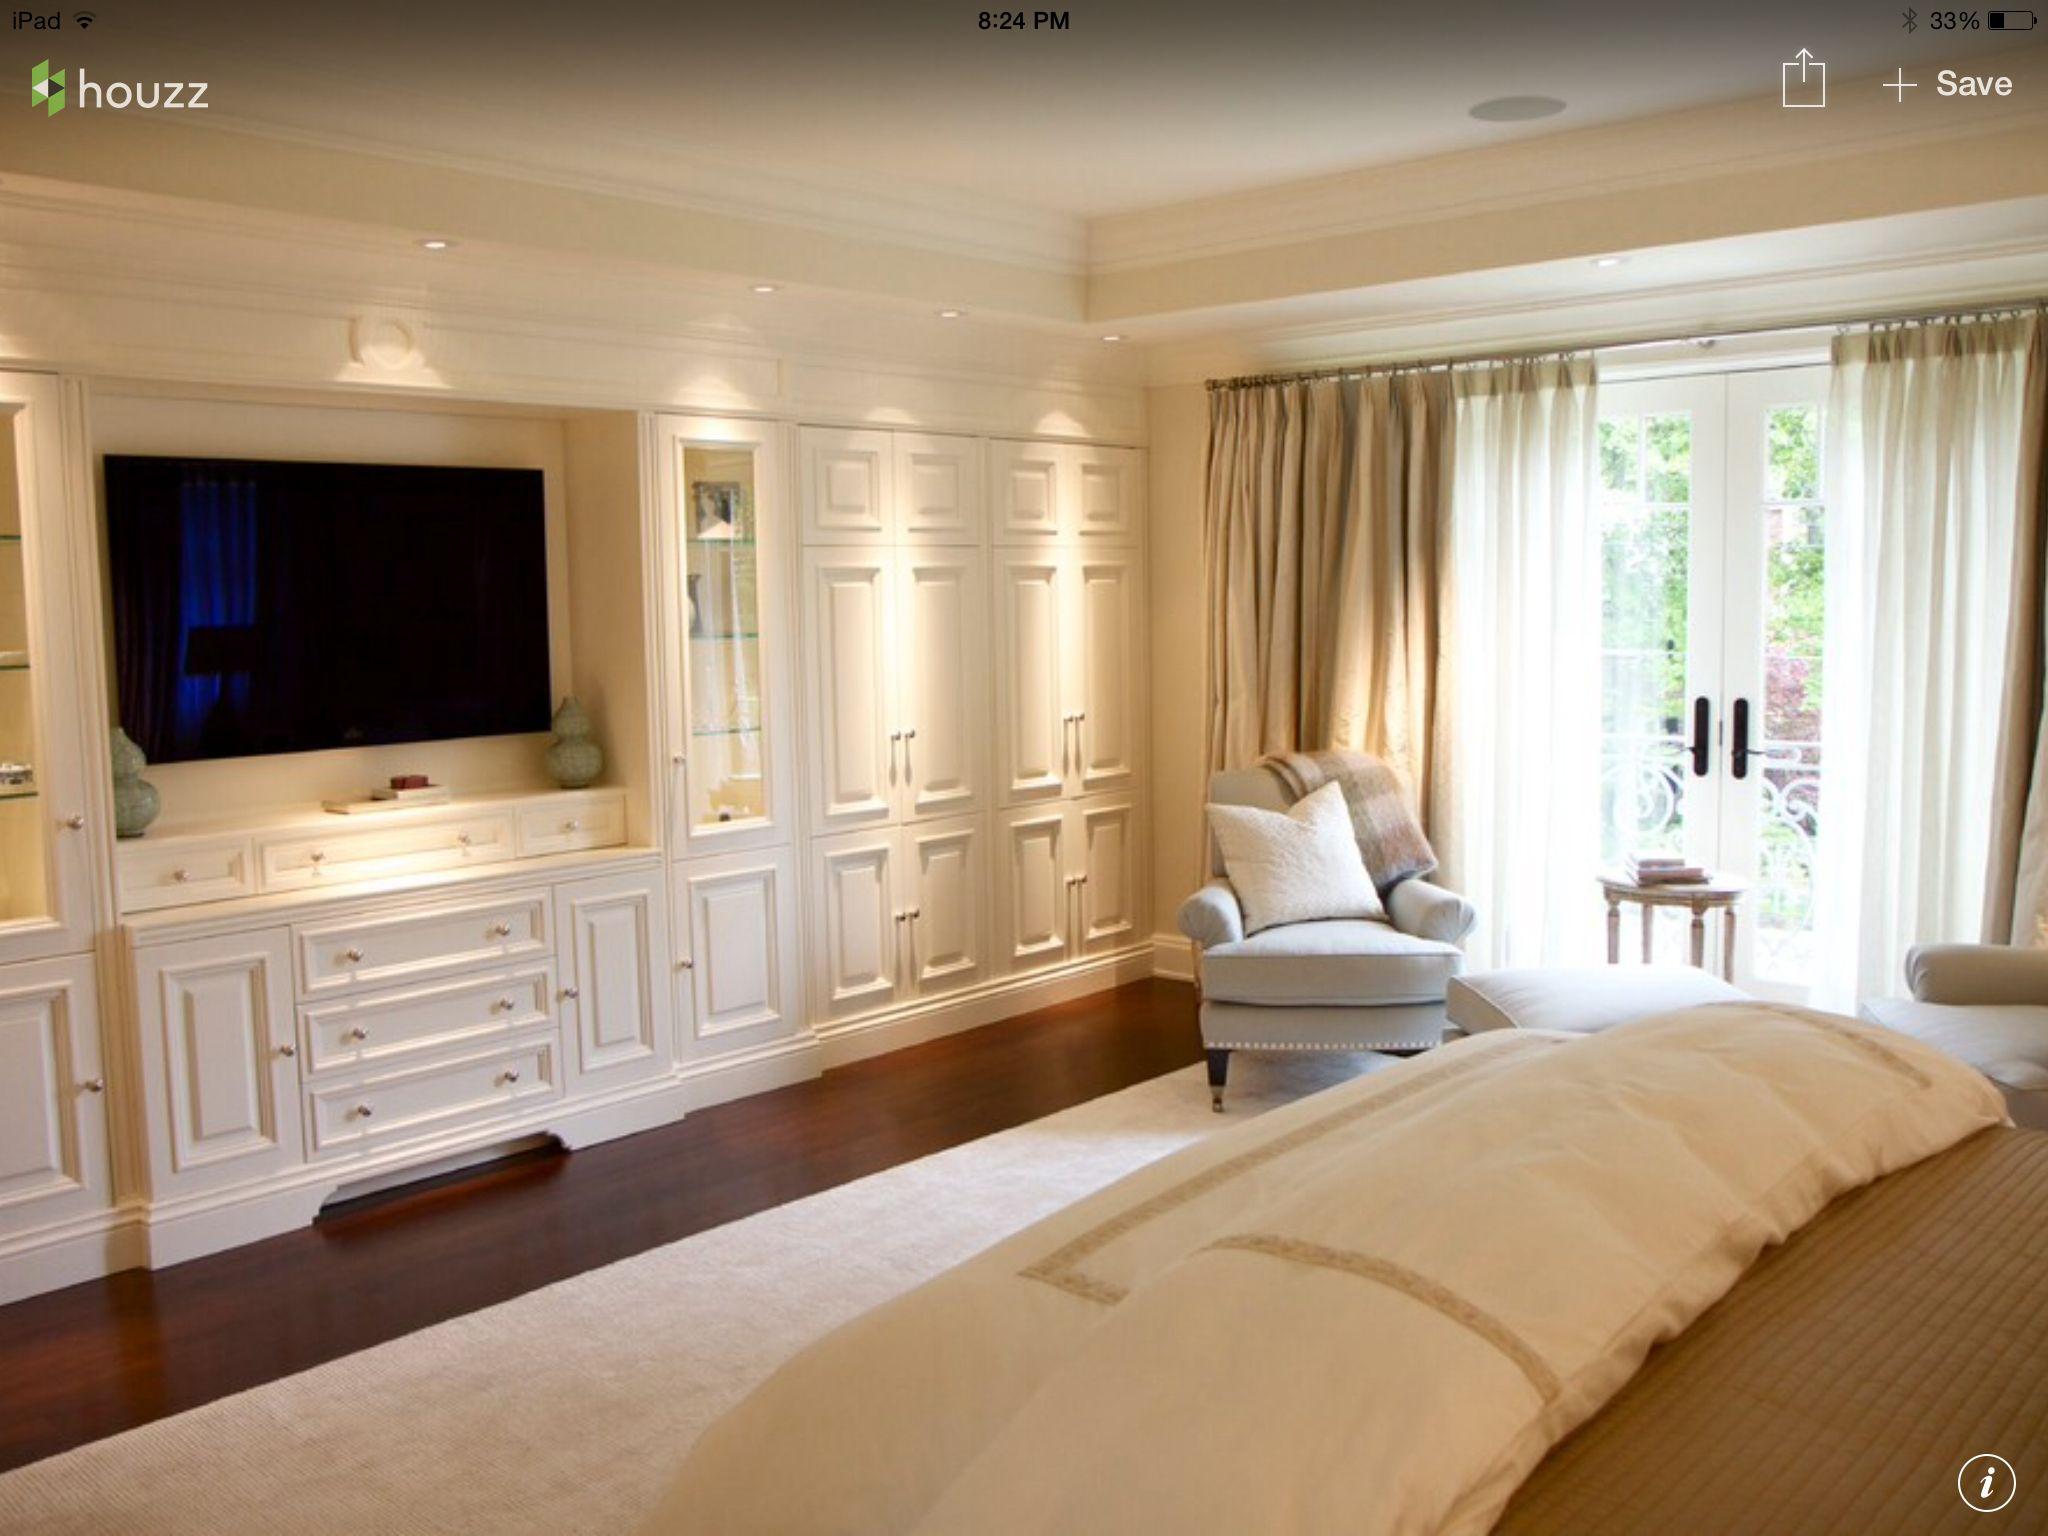 master builtin april 39 s escape in 2019 bedroom cabinets built in bedroom cabinets bedroom. Black Bedroom Furniture Sets. Home Design Ideas